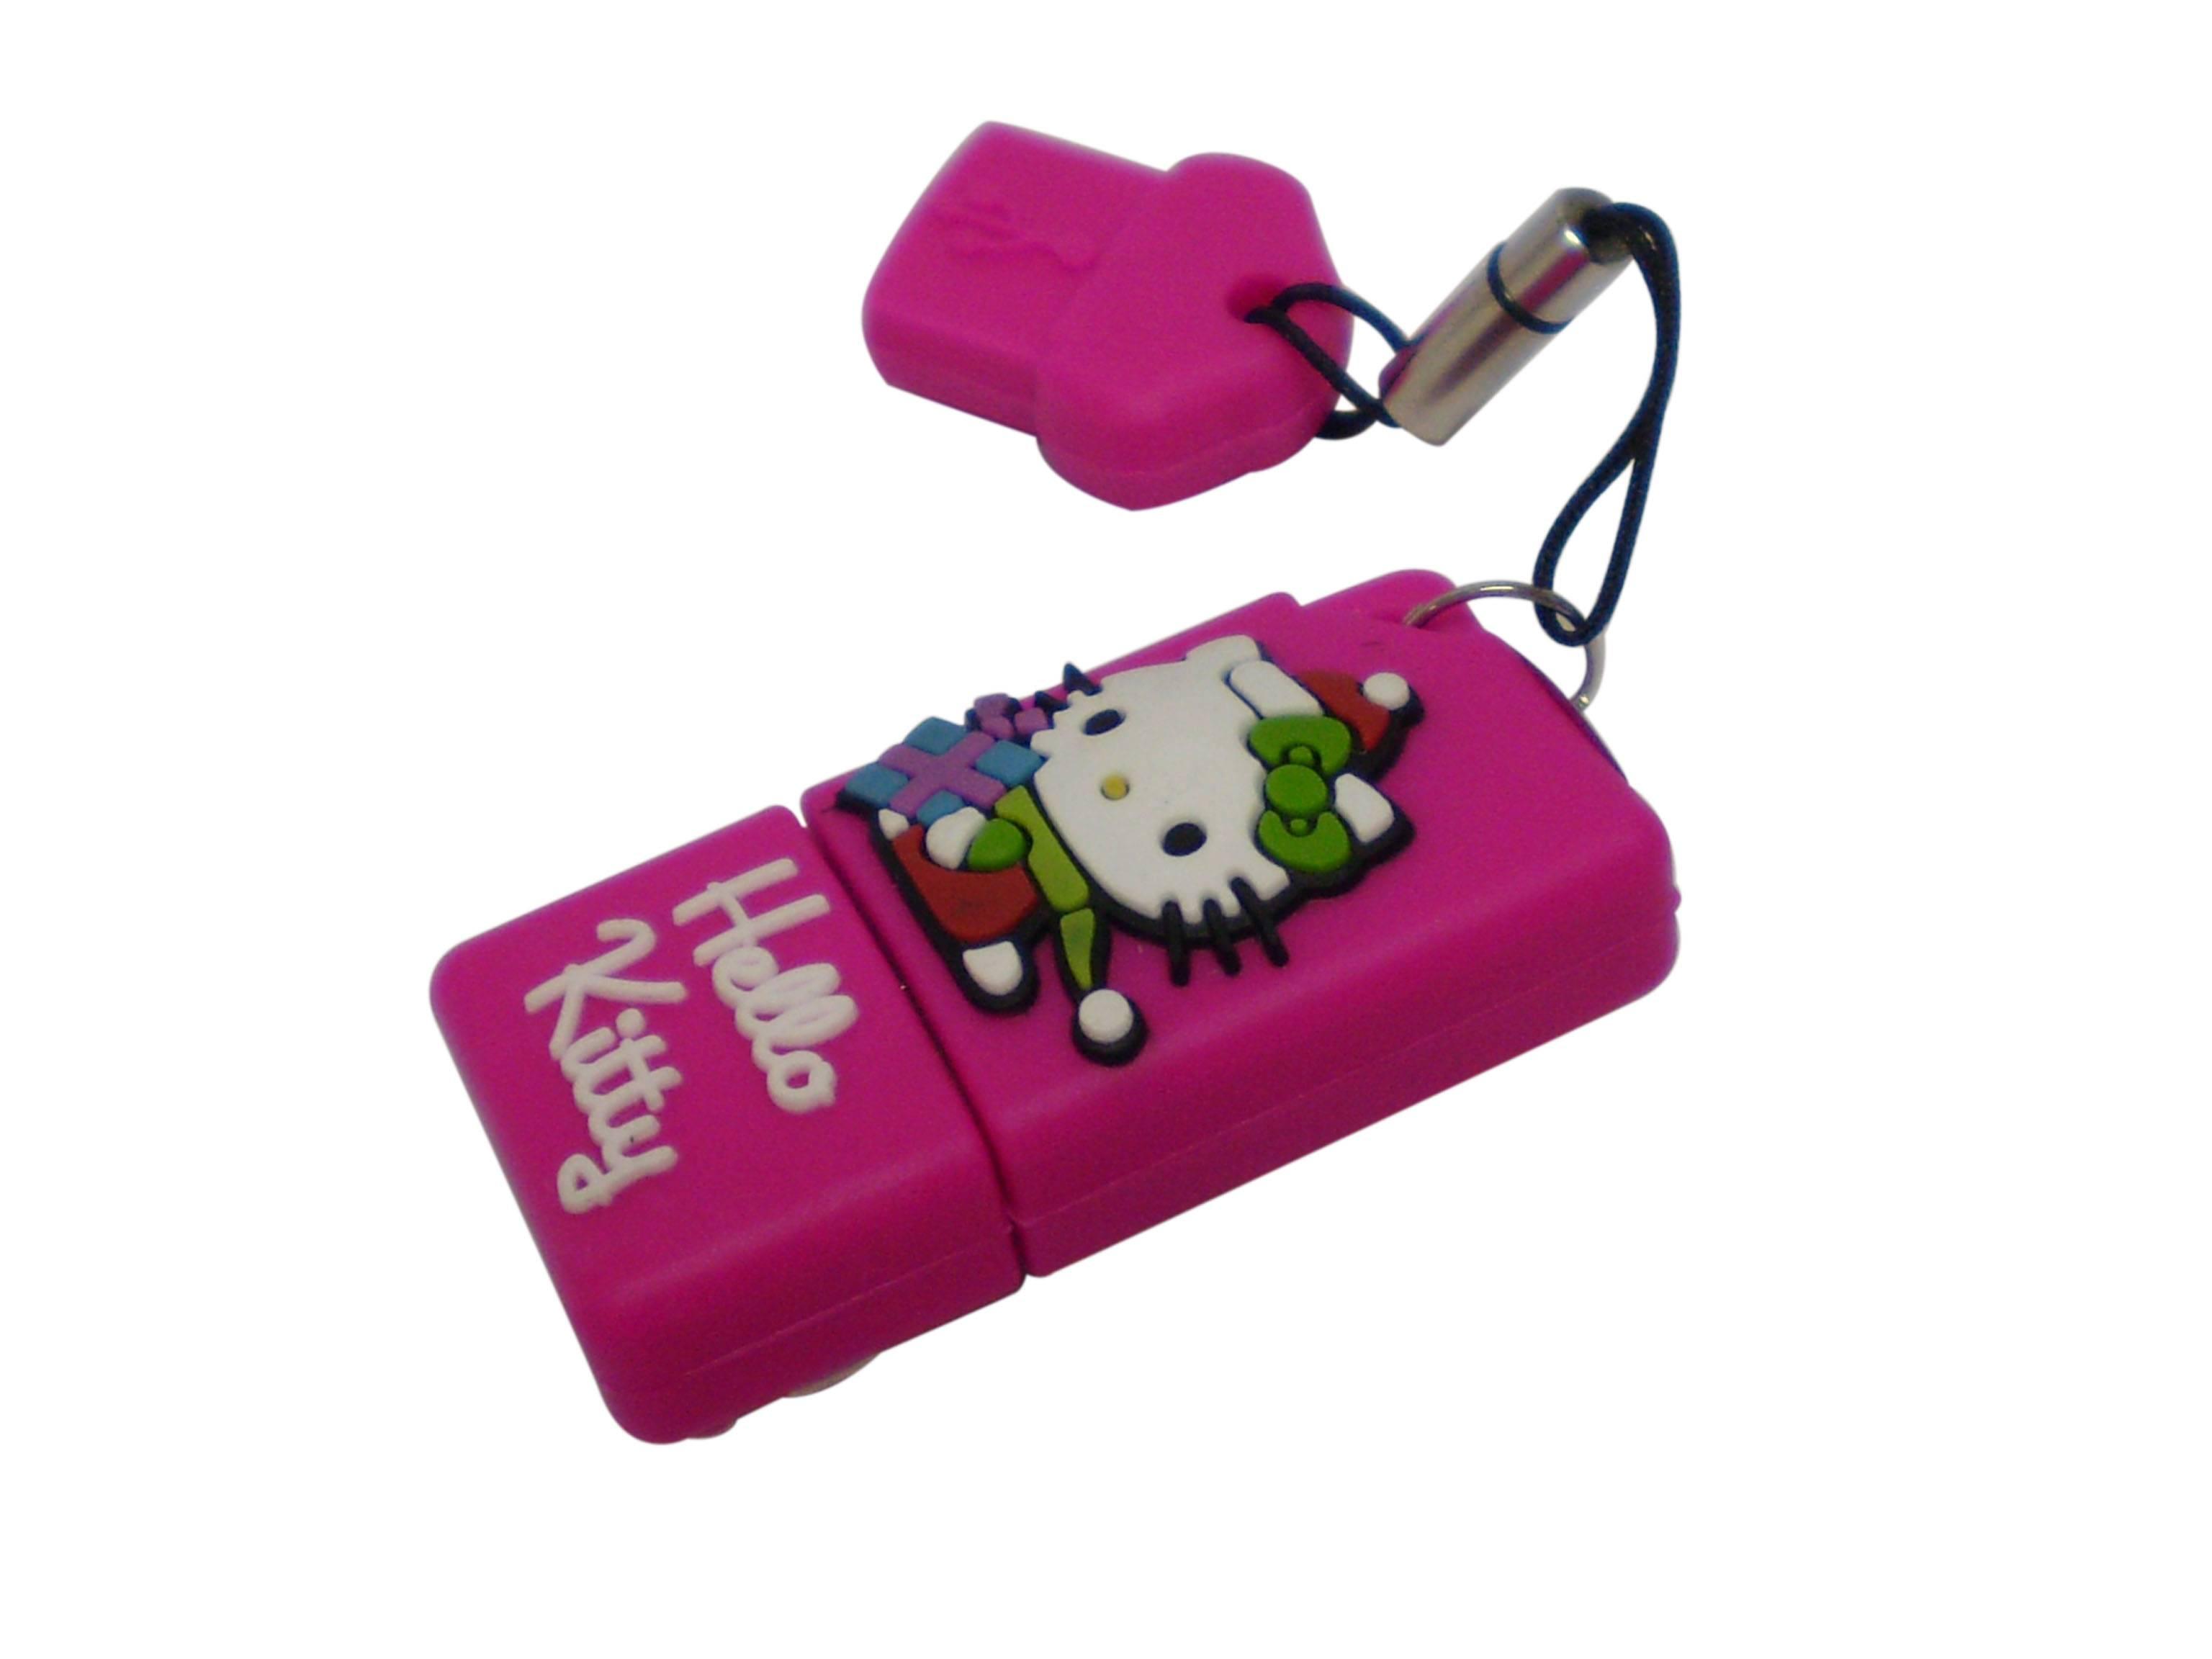 Secure USB Flash Drive